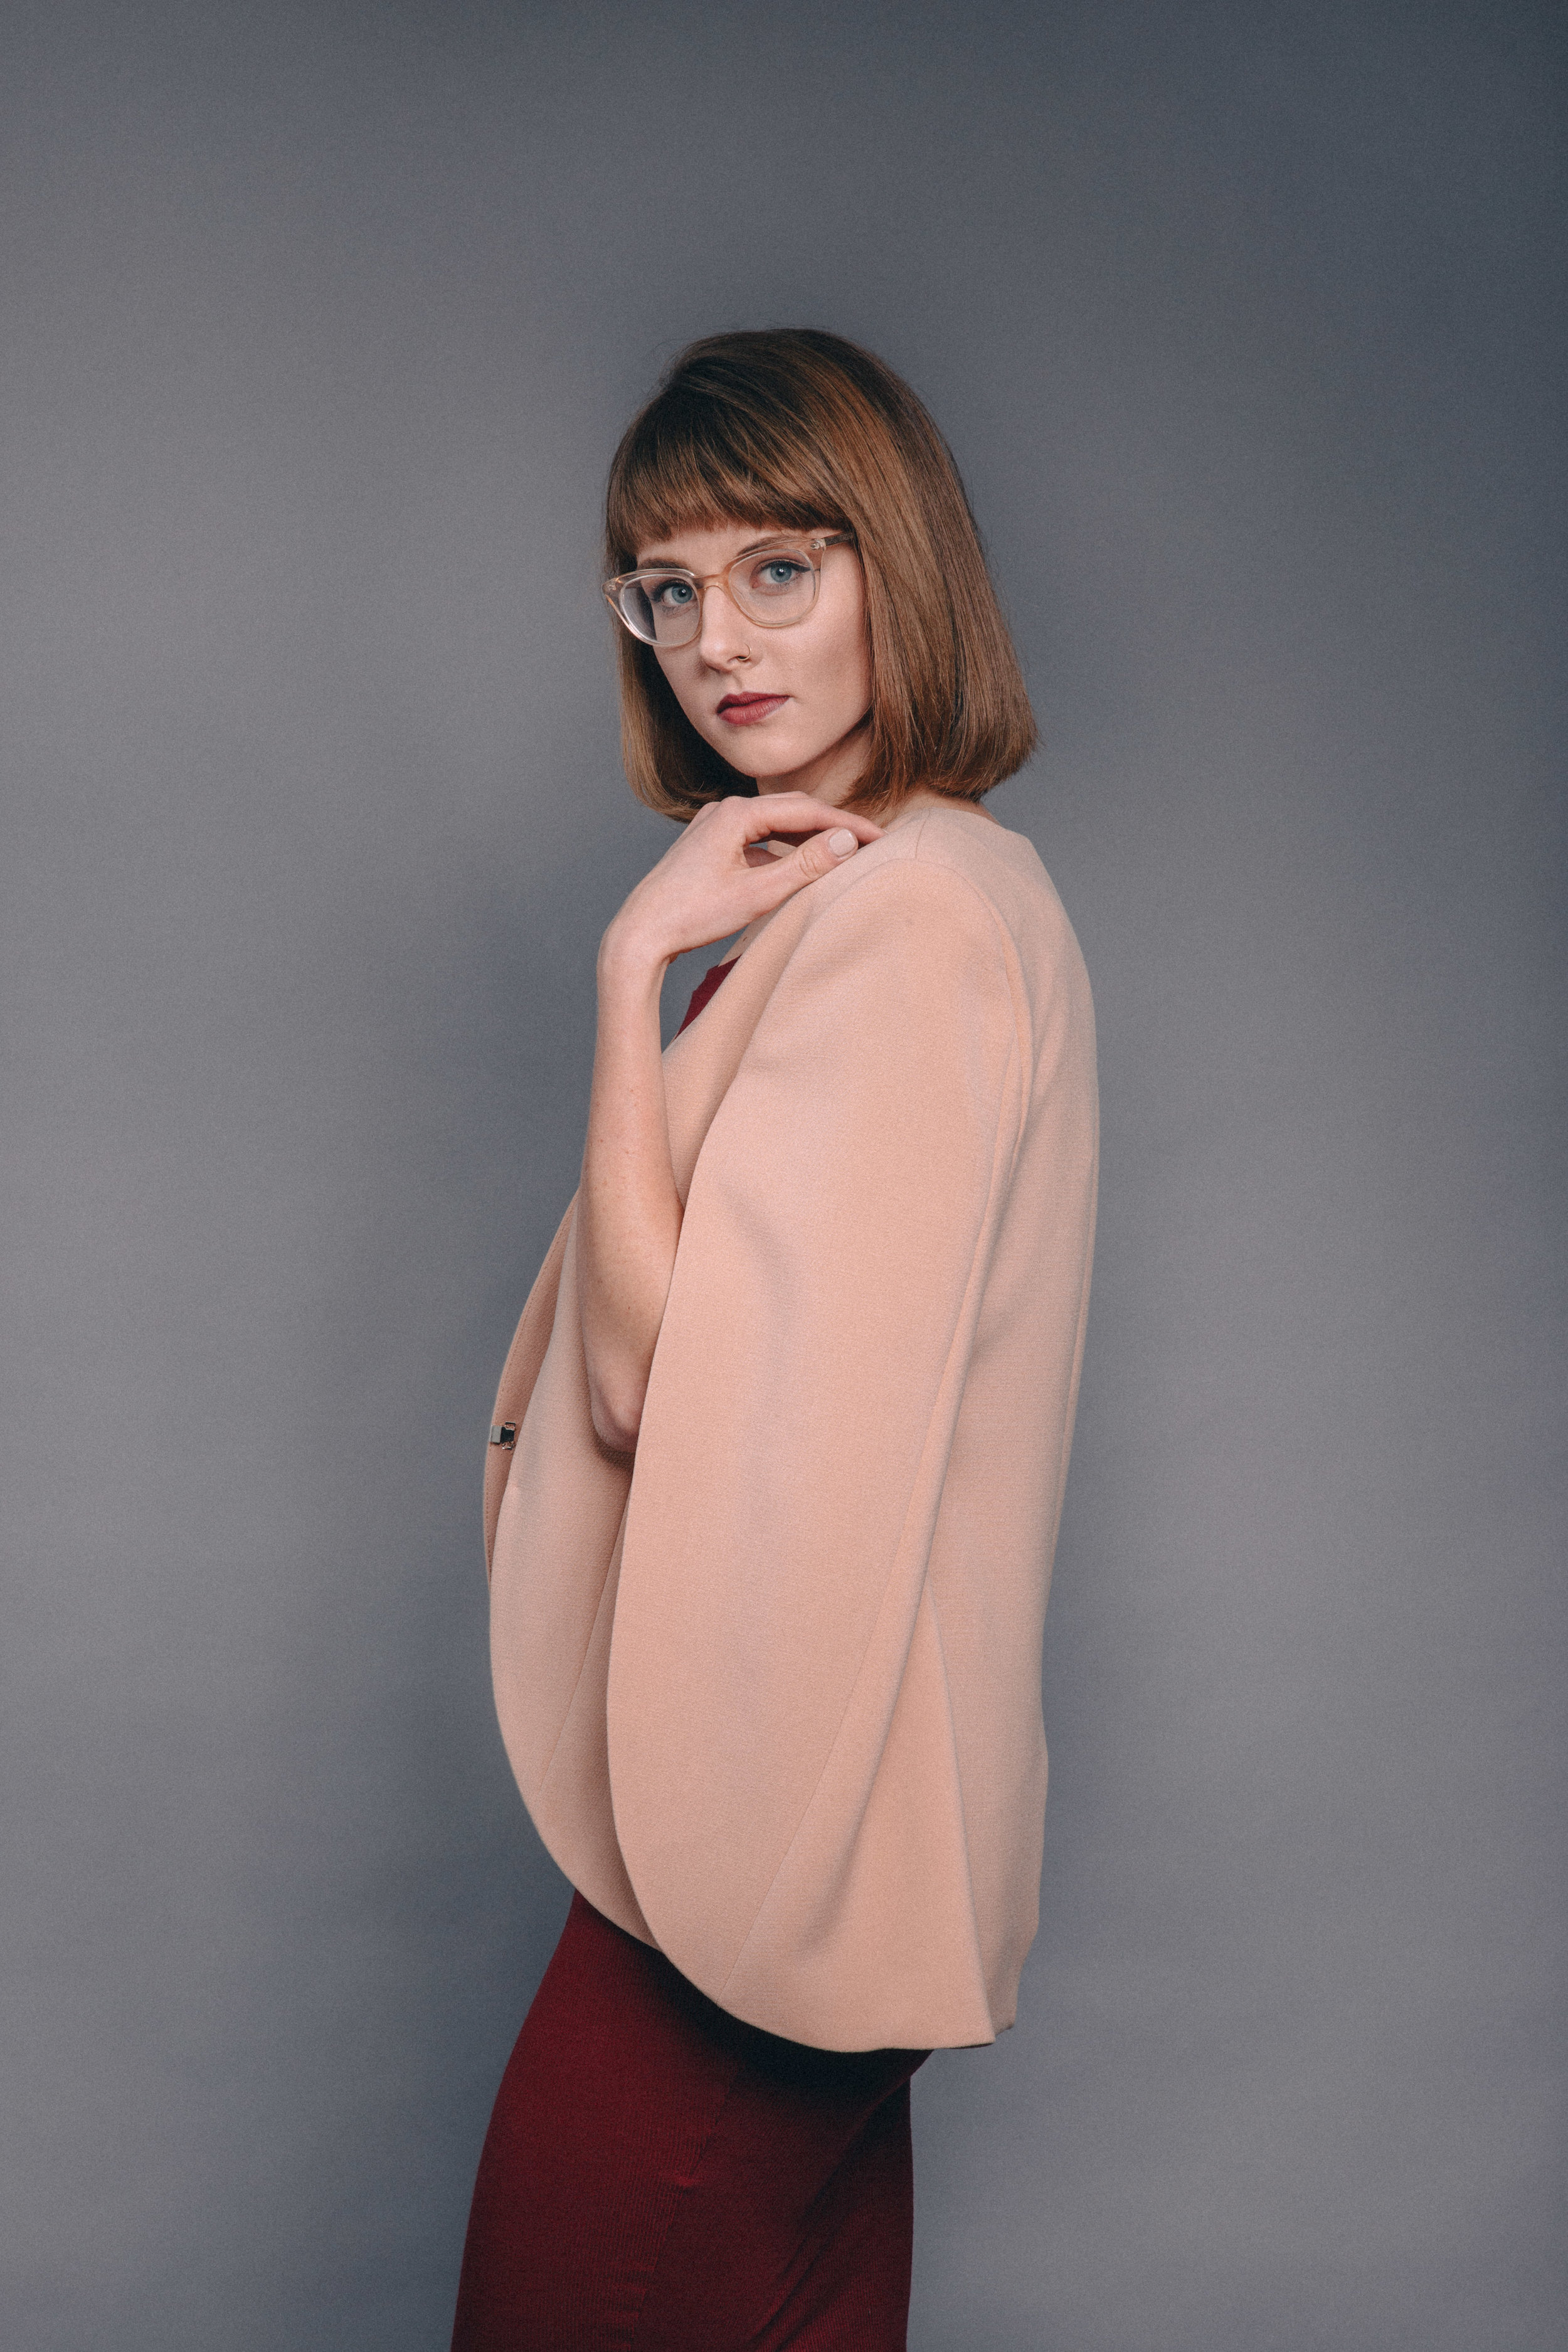 Atid   basic tee dress //   Blaque Label   cape